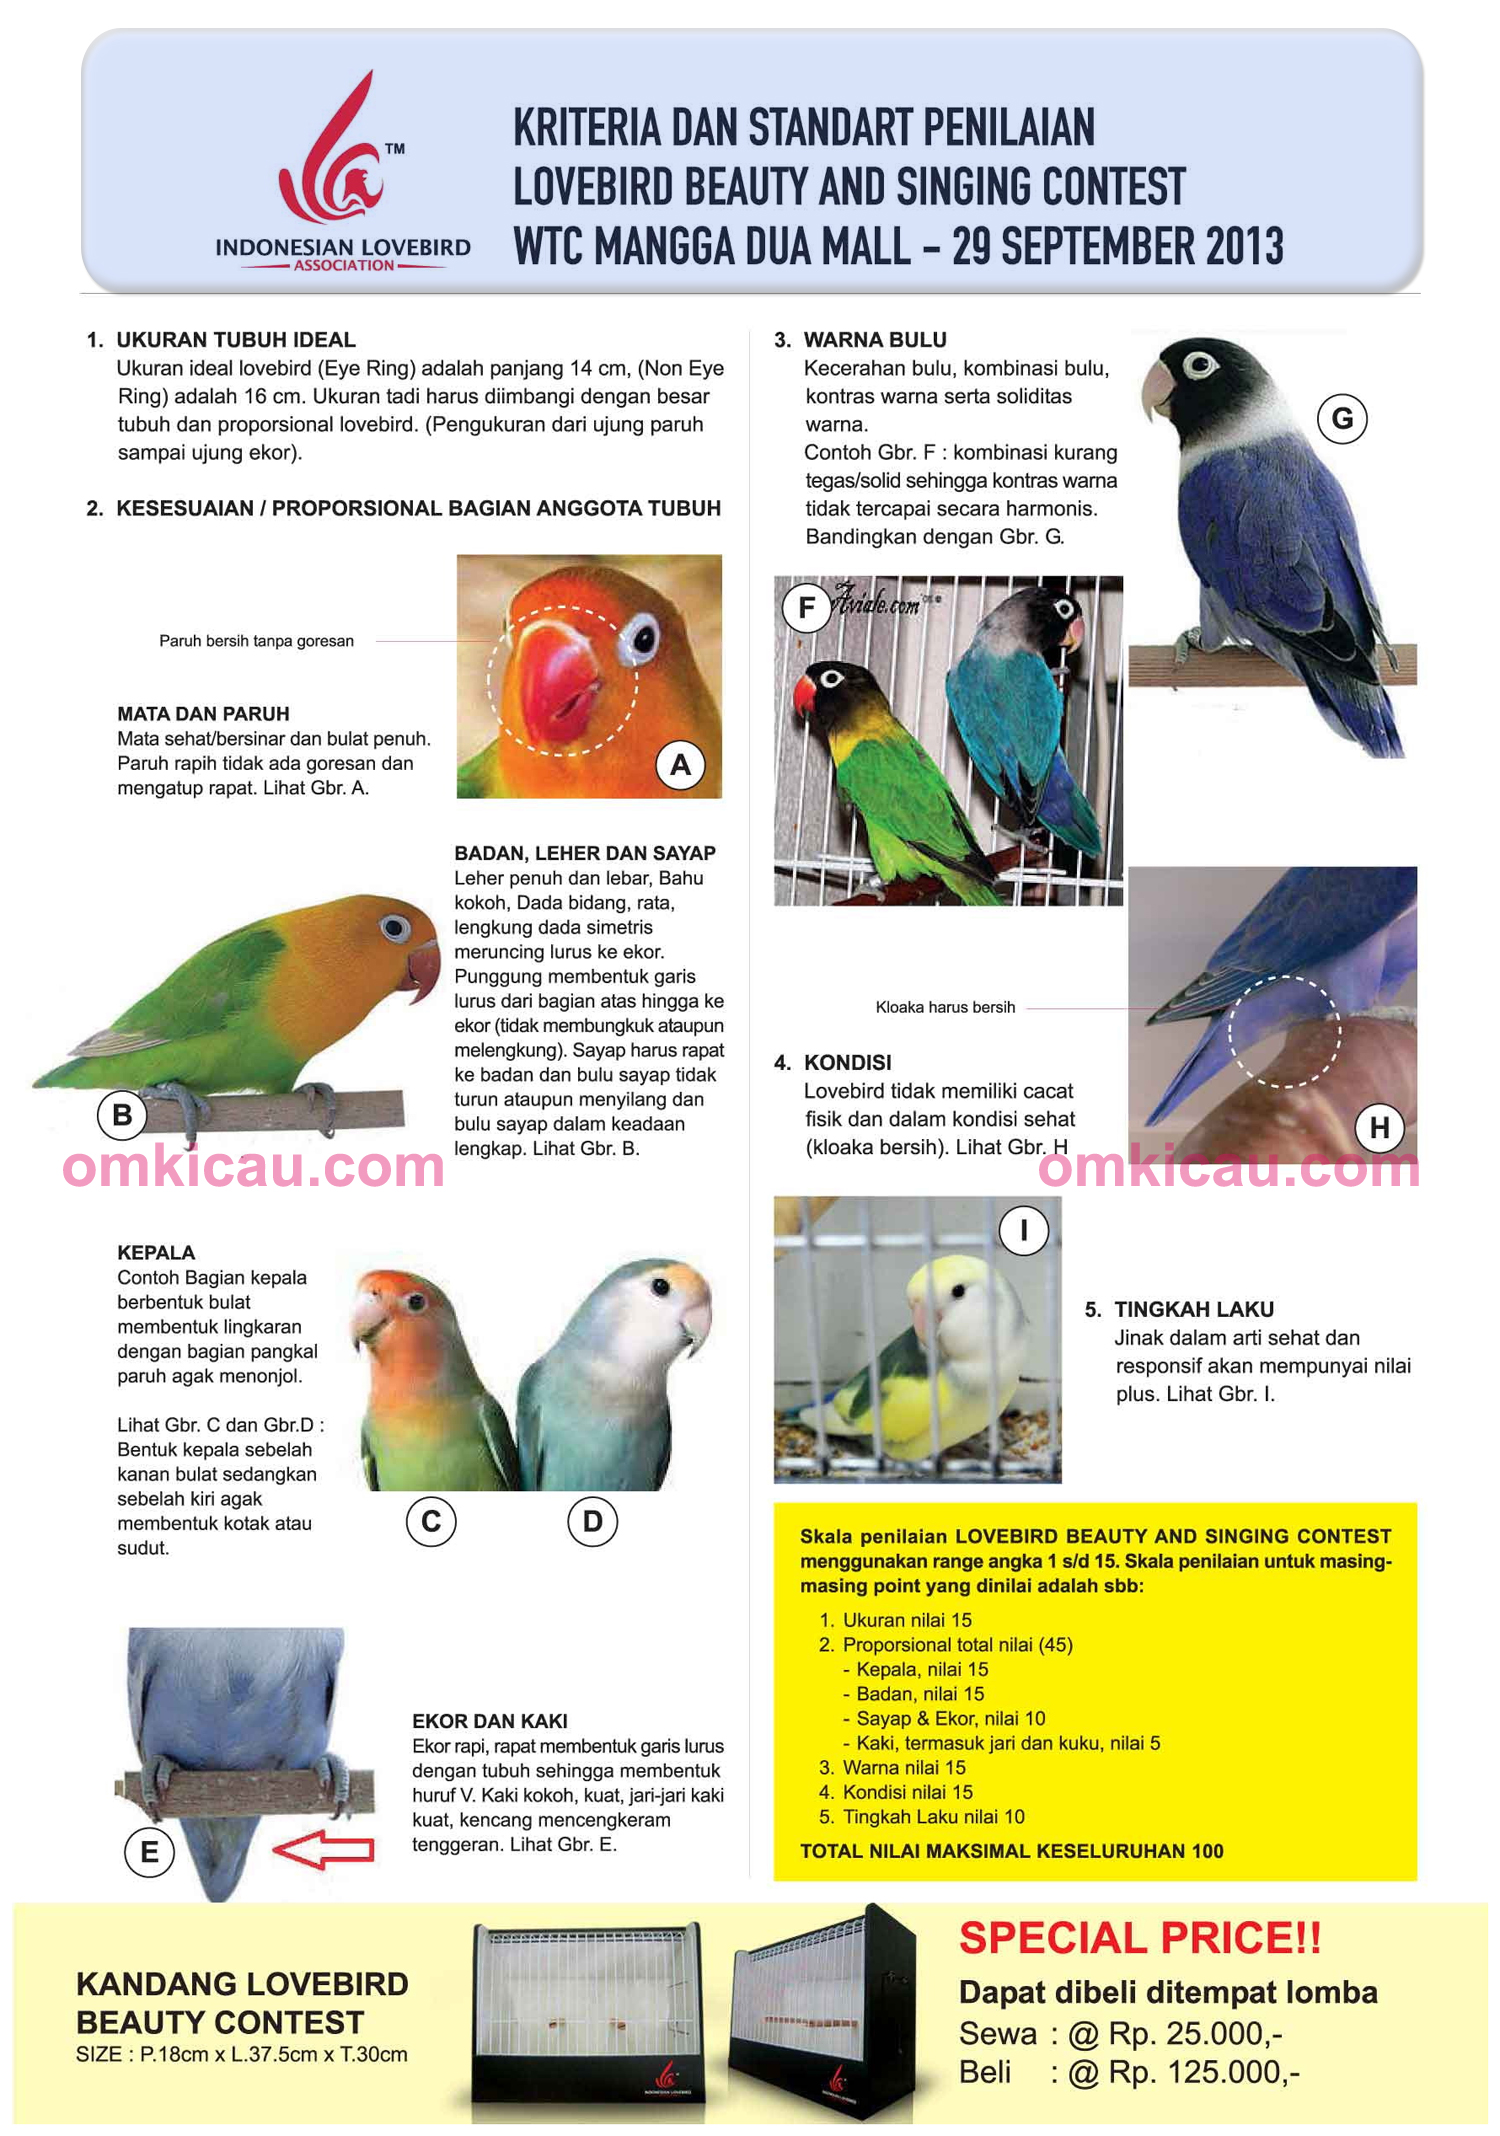 Kriteria penilaian lomba lovebird